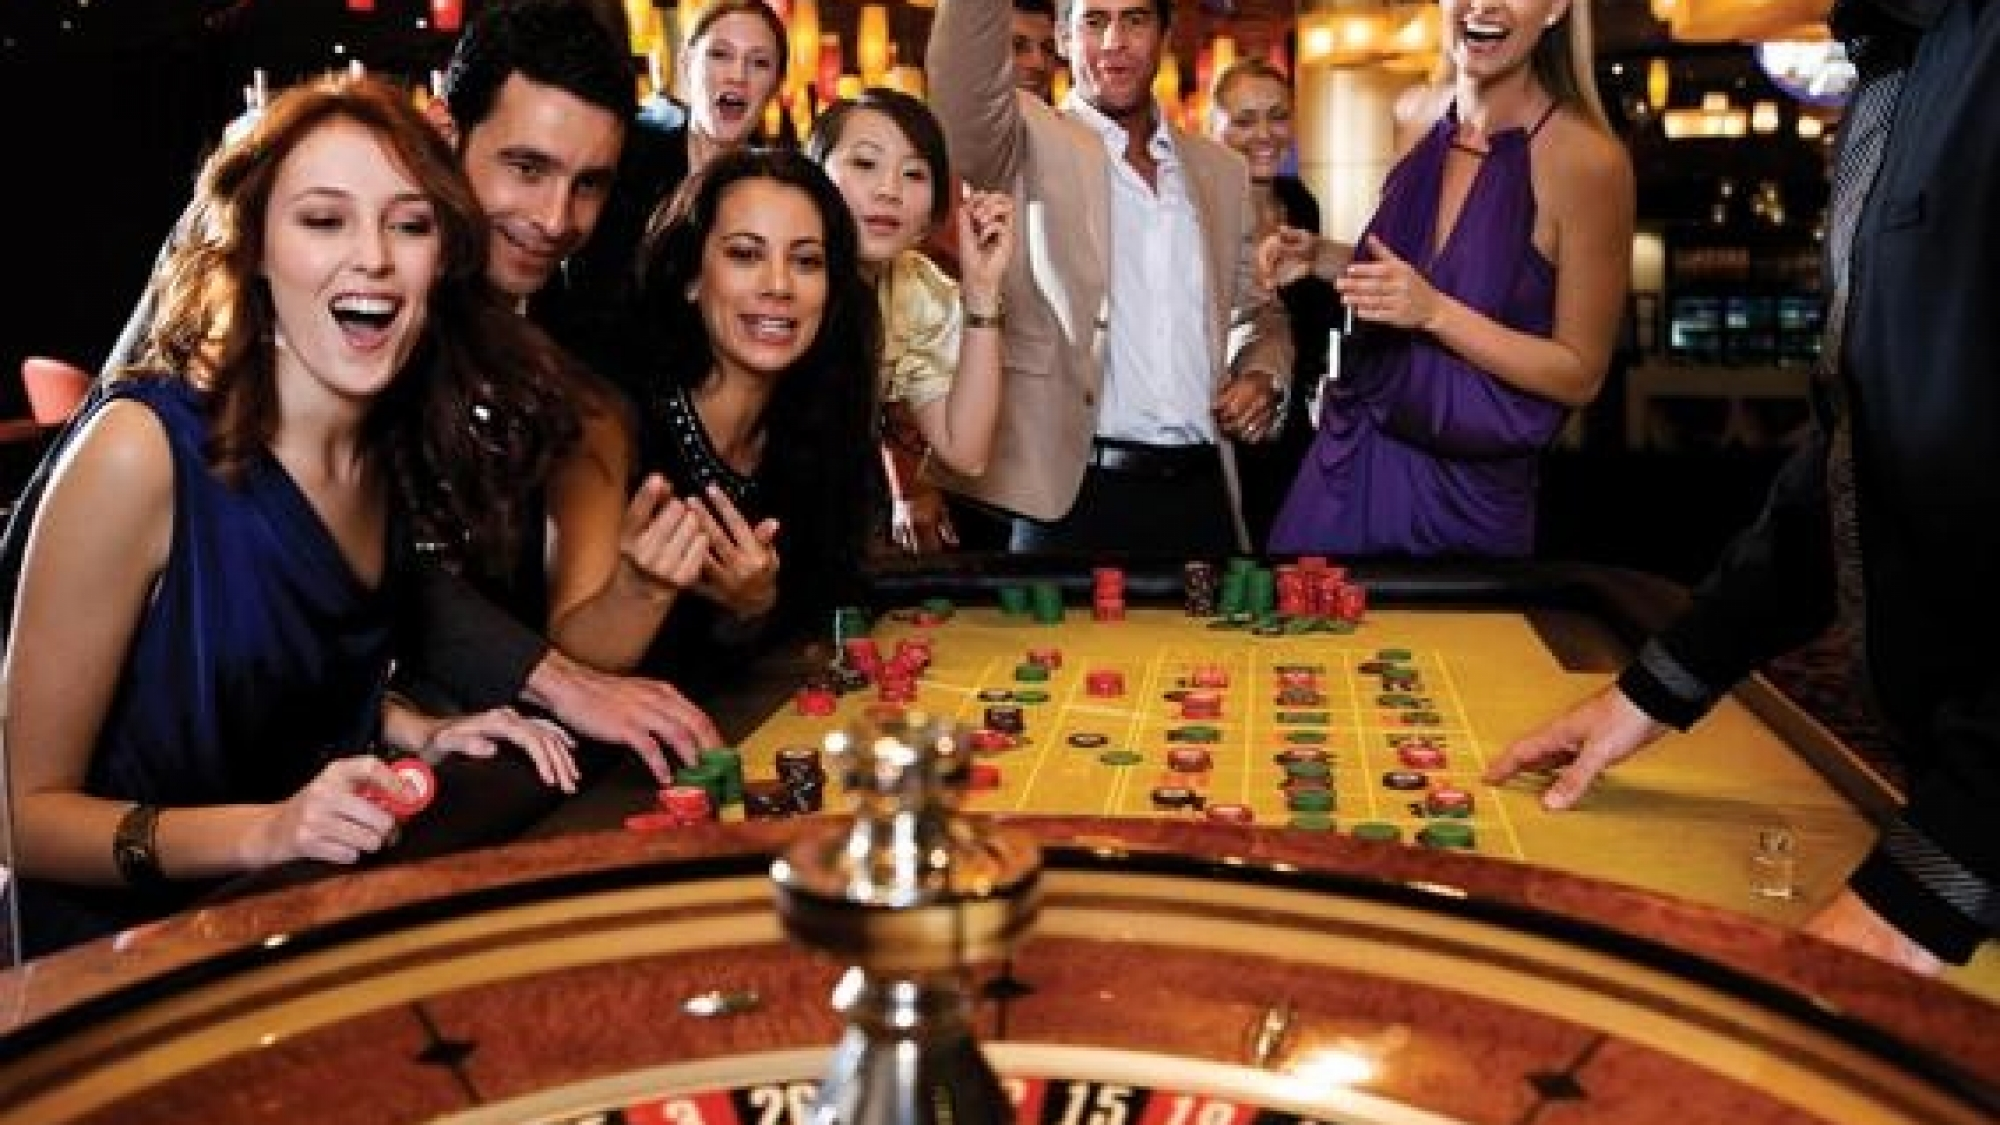 The 10 Commandments of gambling online